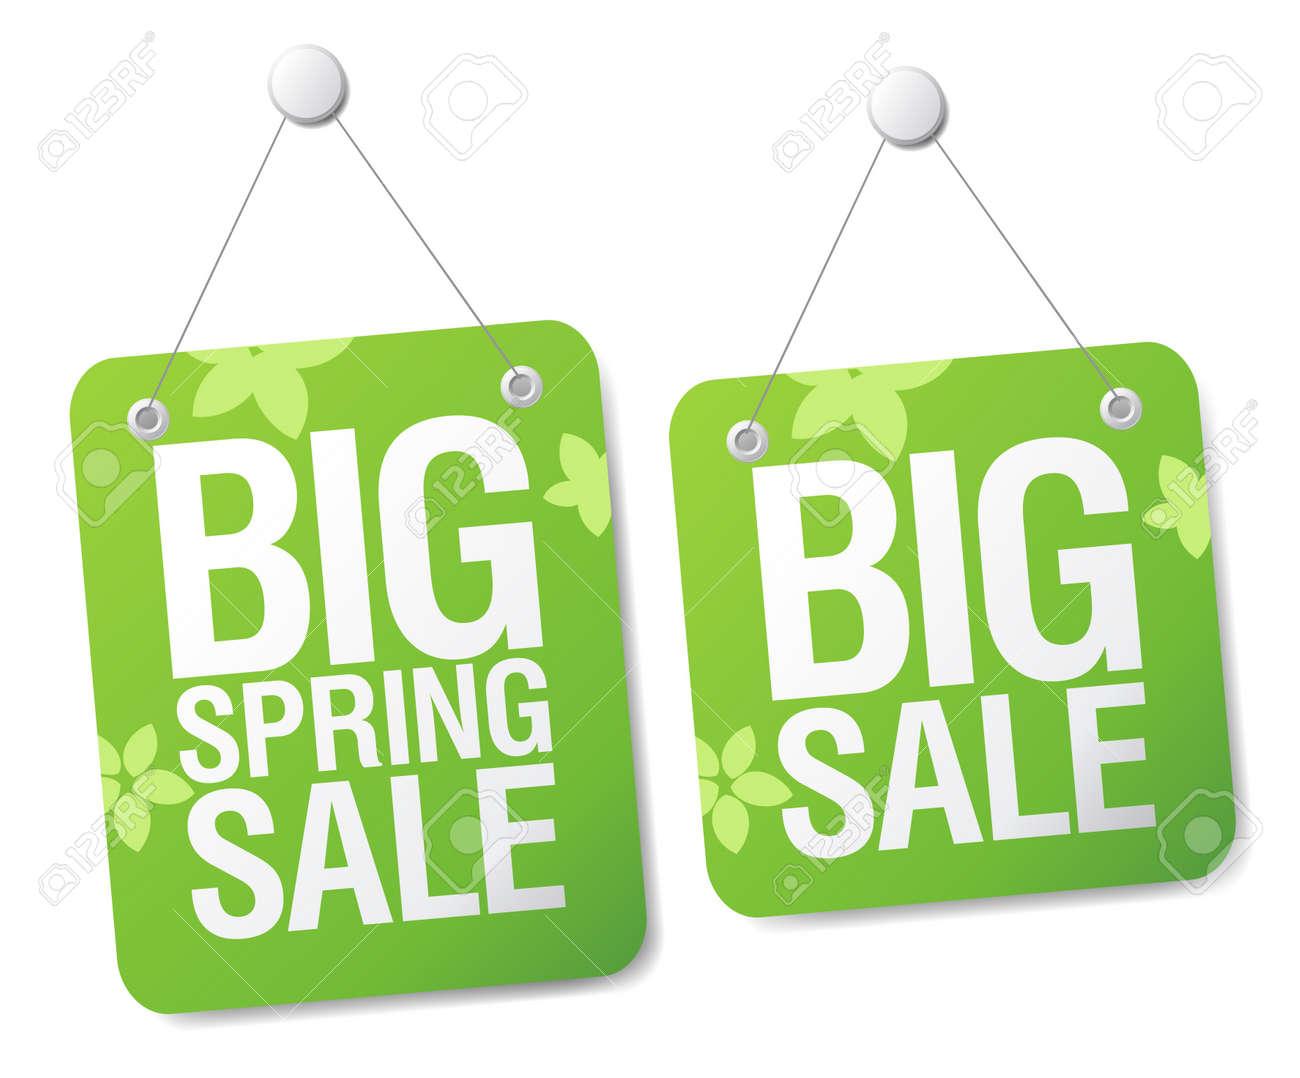 Big spring sale signs set. Stock Vector - 9334445